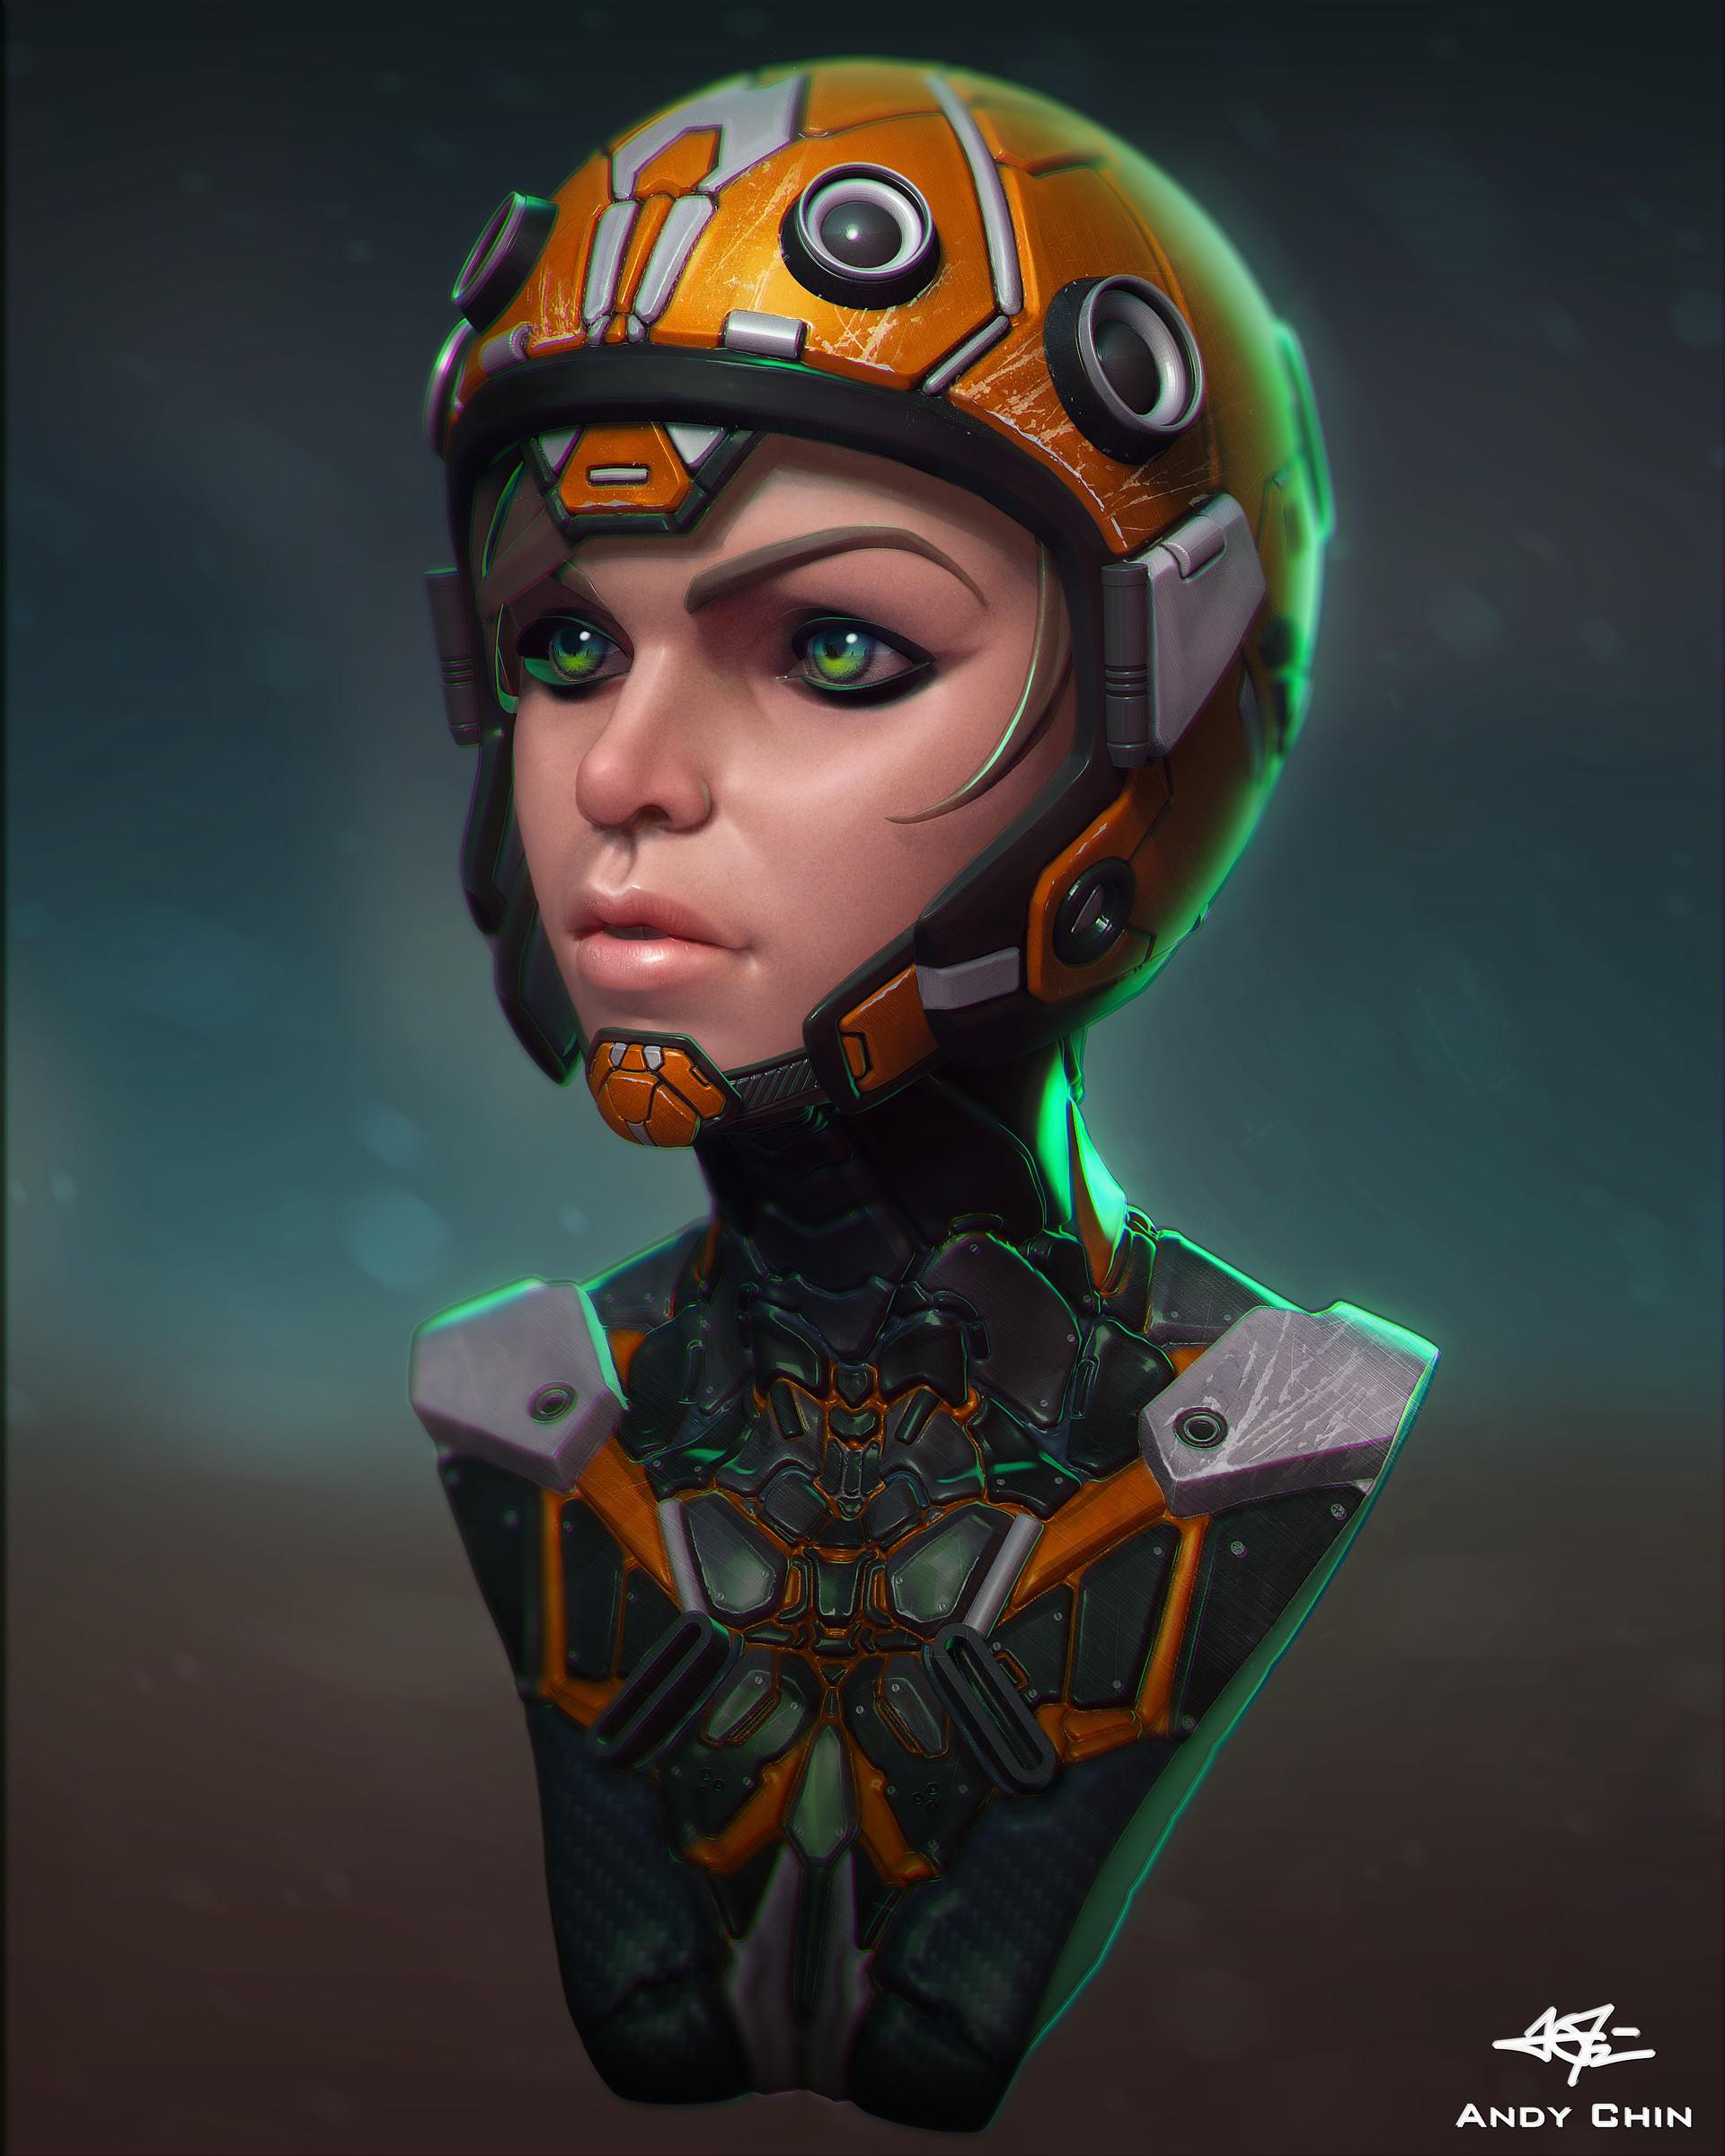 Cyberpunk sci-fi girl, an art print by Dmitry Kaidash - INPRNT